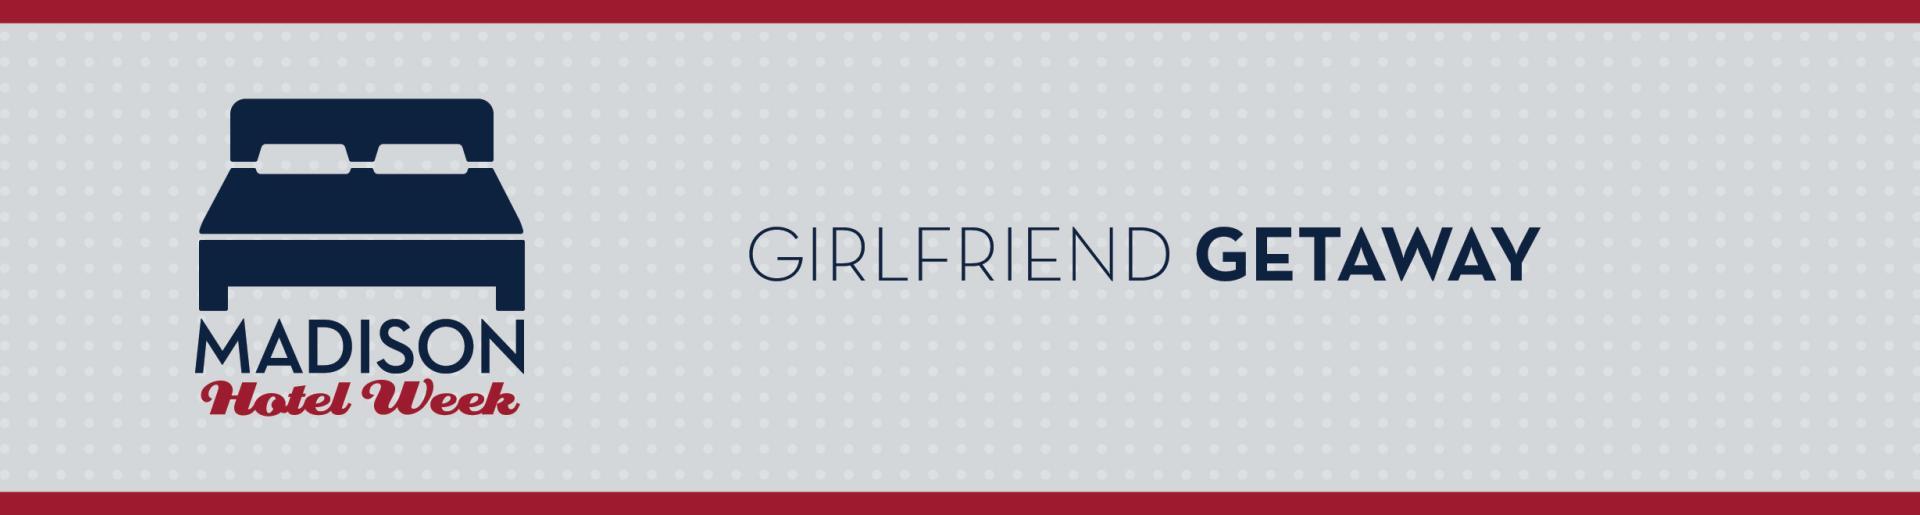 Madison Hotel Week: Girlfriend